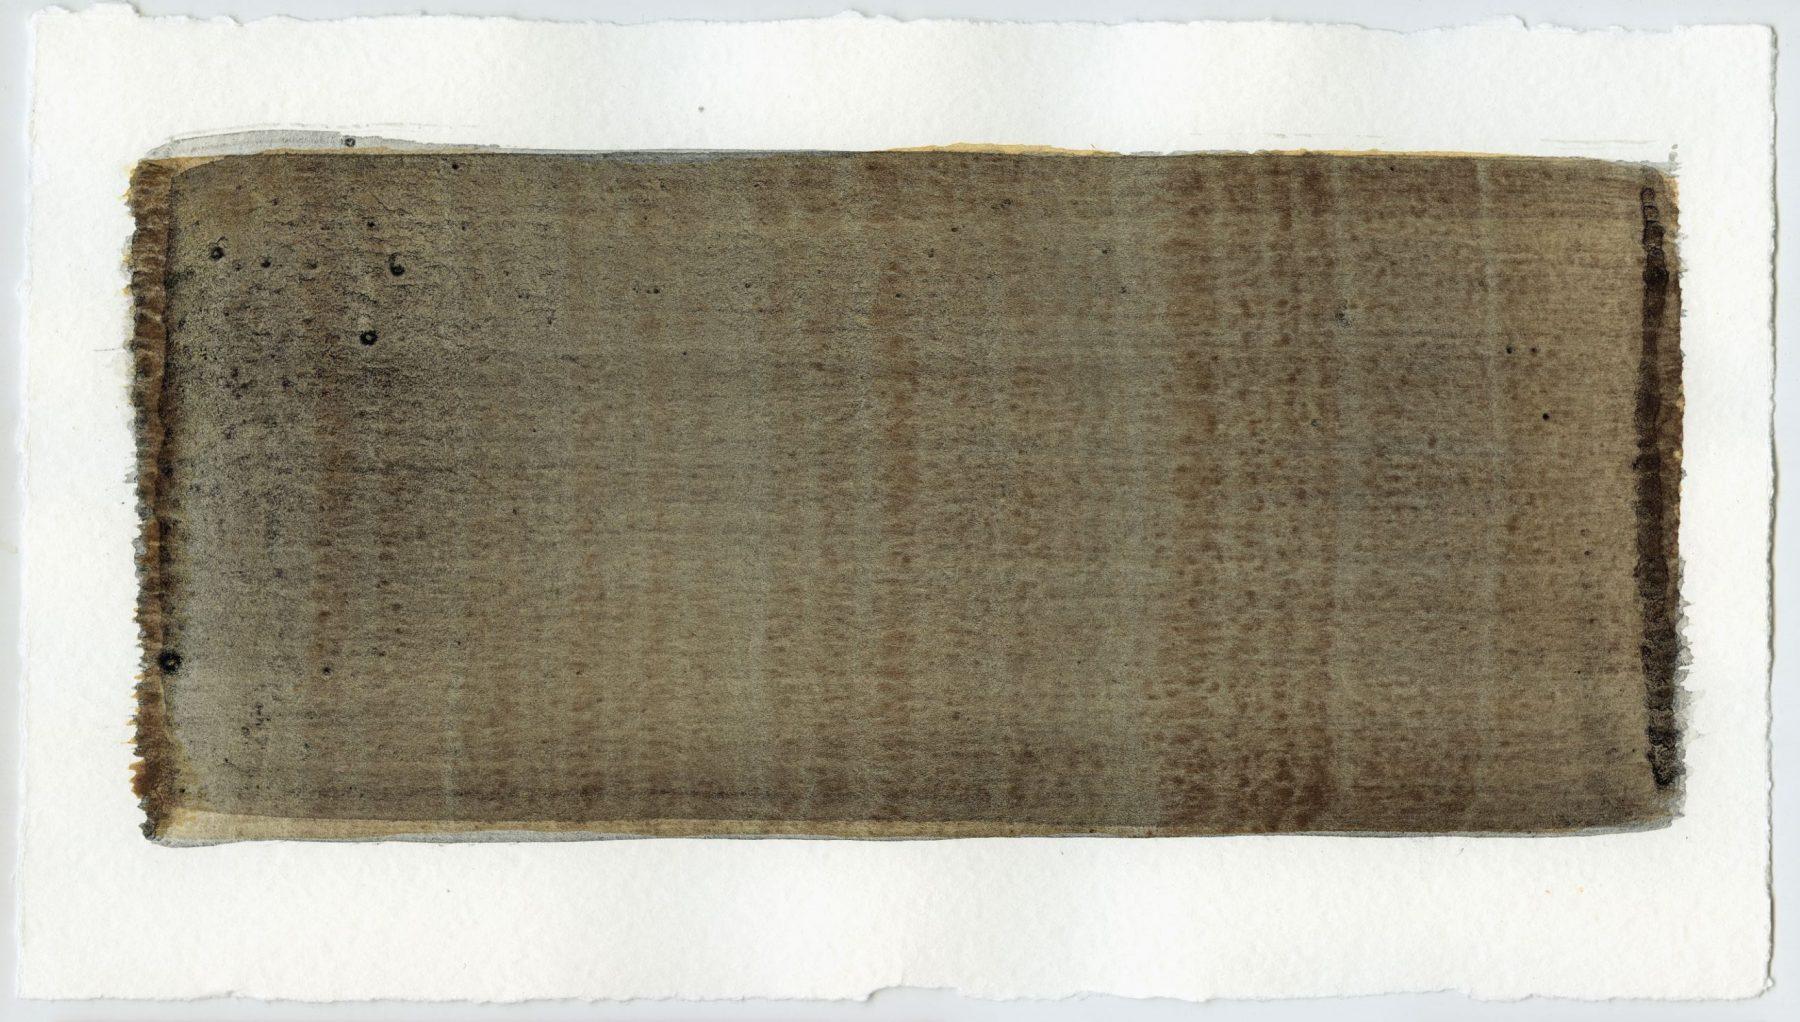 Brush stroke no. 53 - Selfmade pigment: Slingerpad zwart, IJzeroer gebrand, Slingerpad zwart